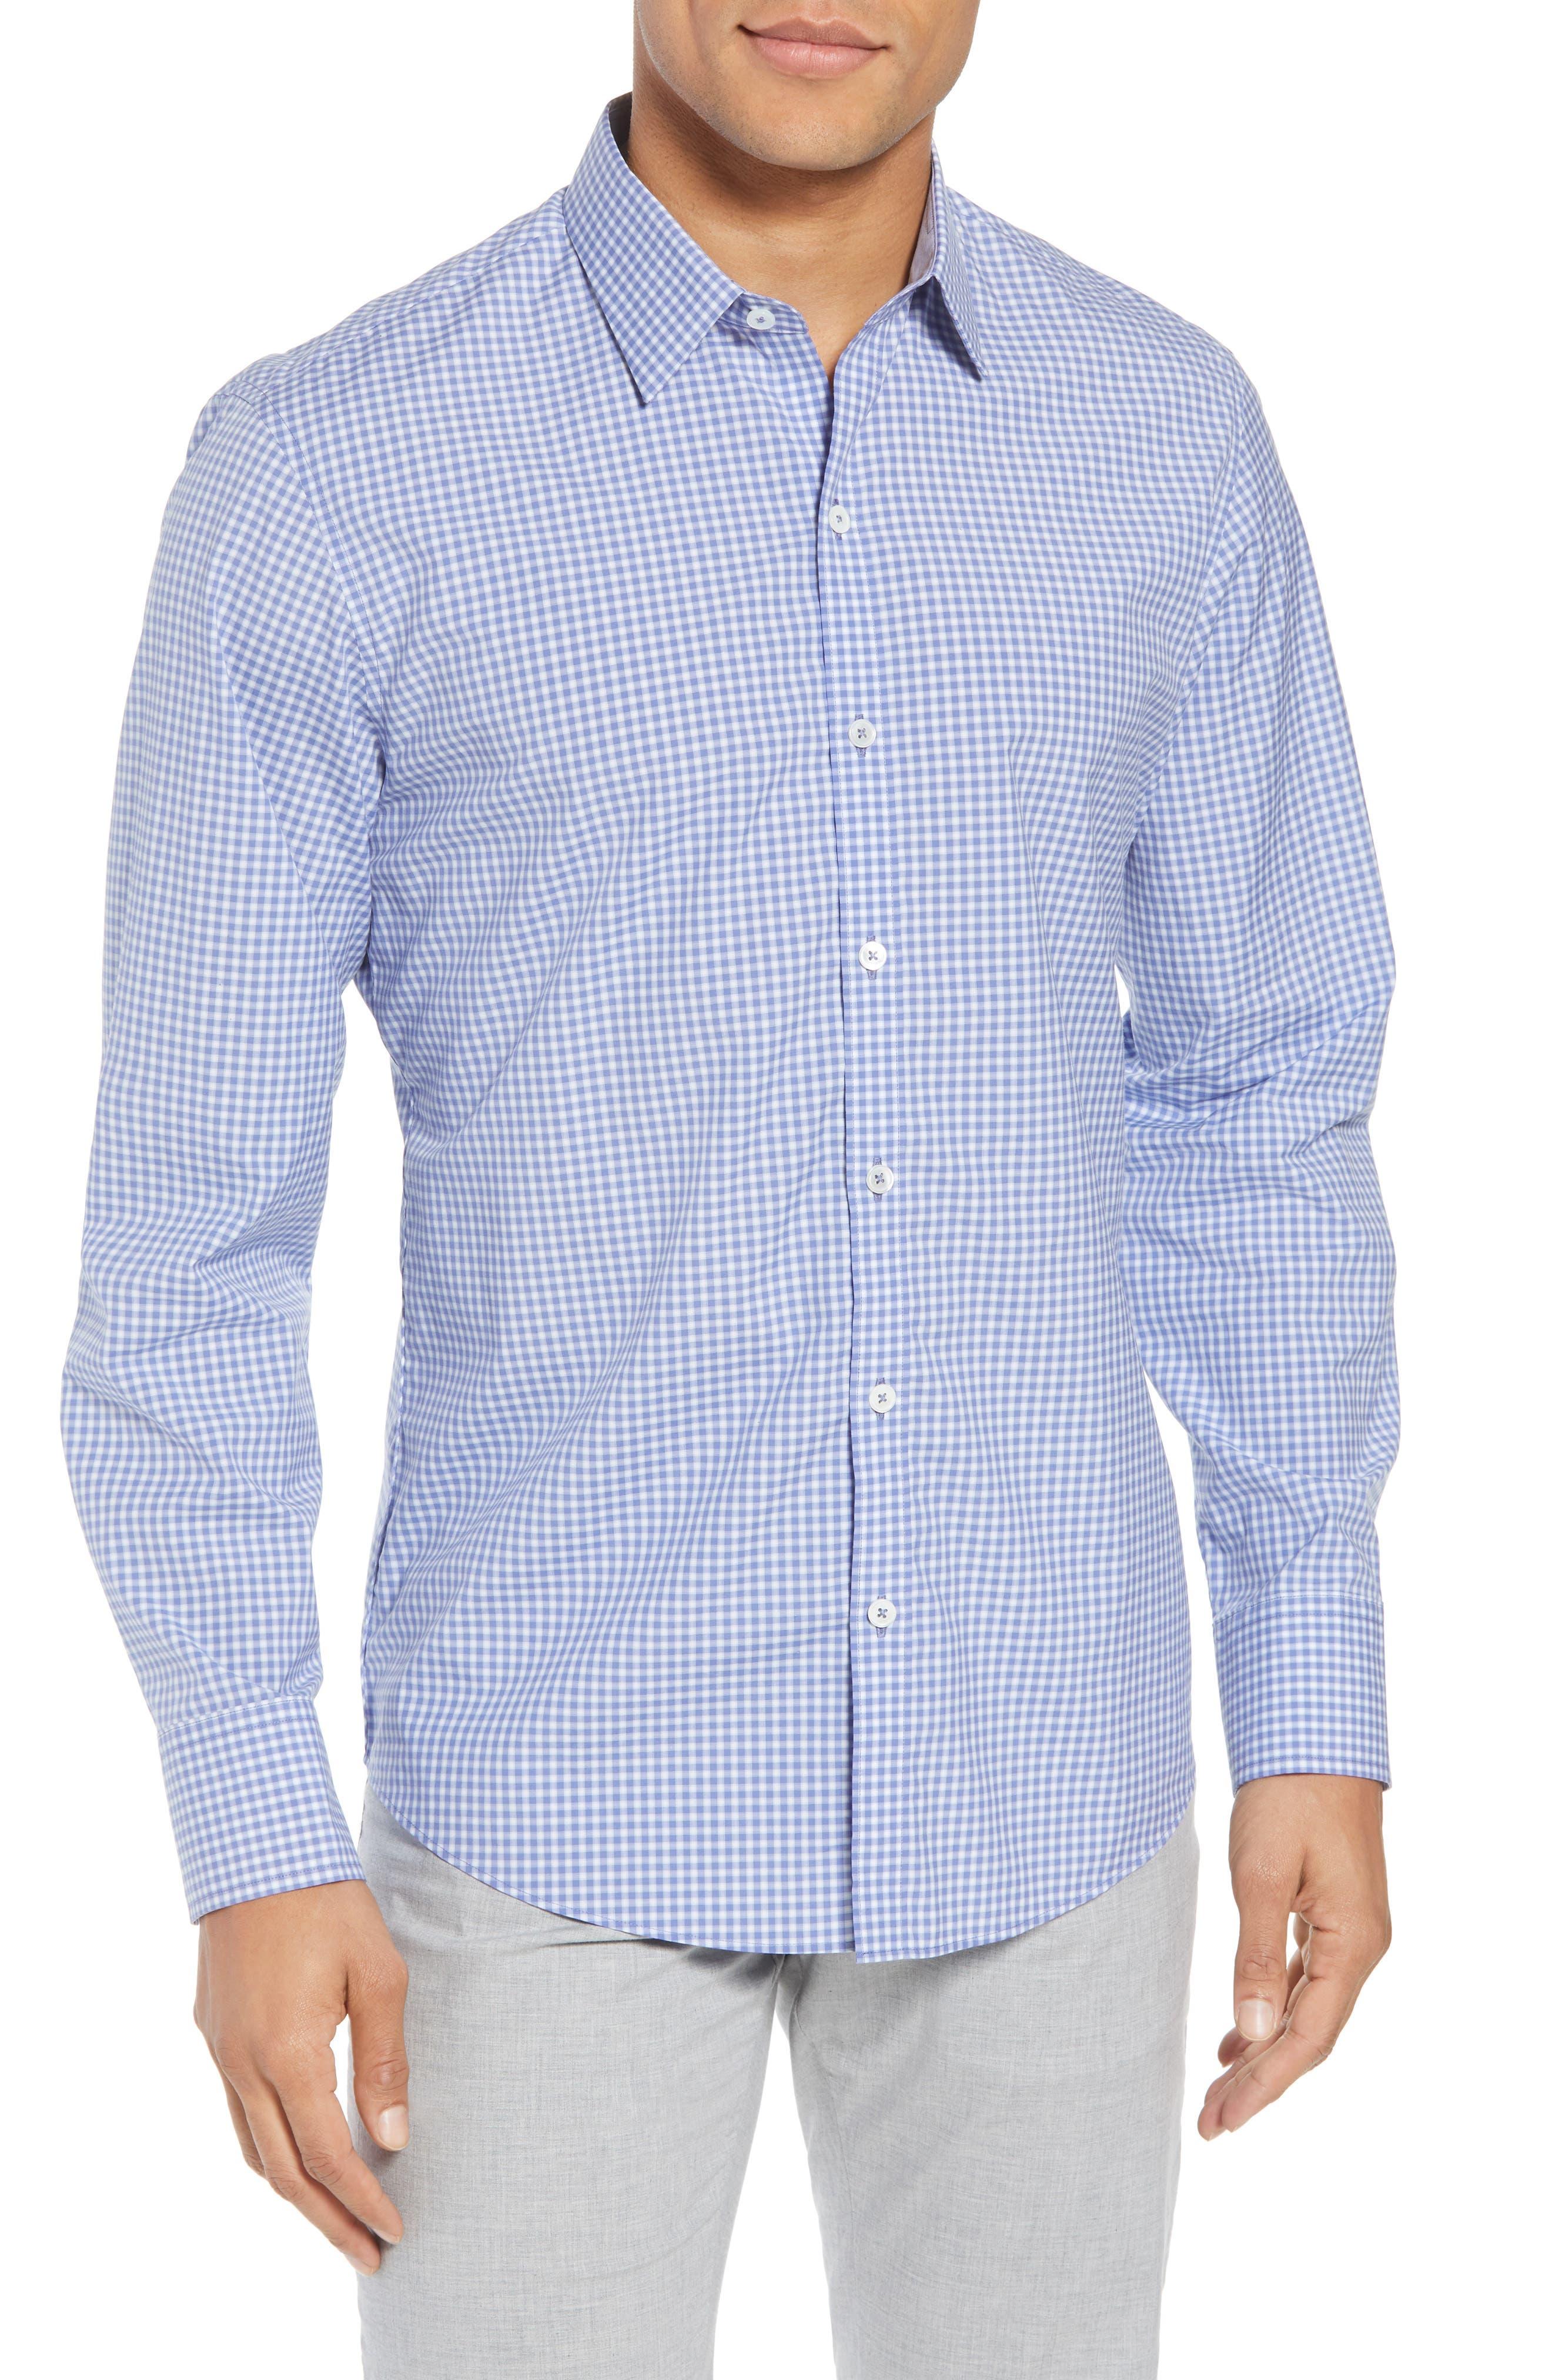 Winston Regular Fit Sport Shirt,                             Main thumbnail 1, color,                             422